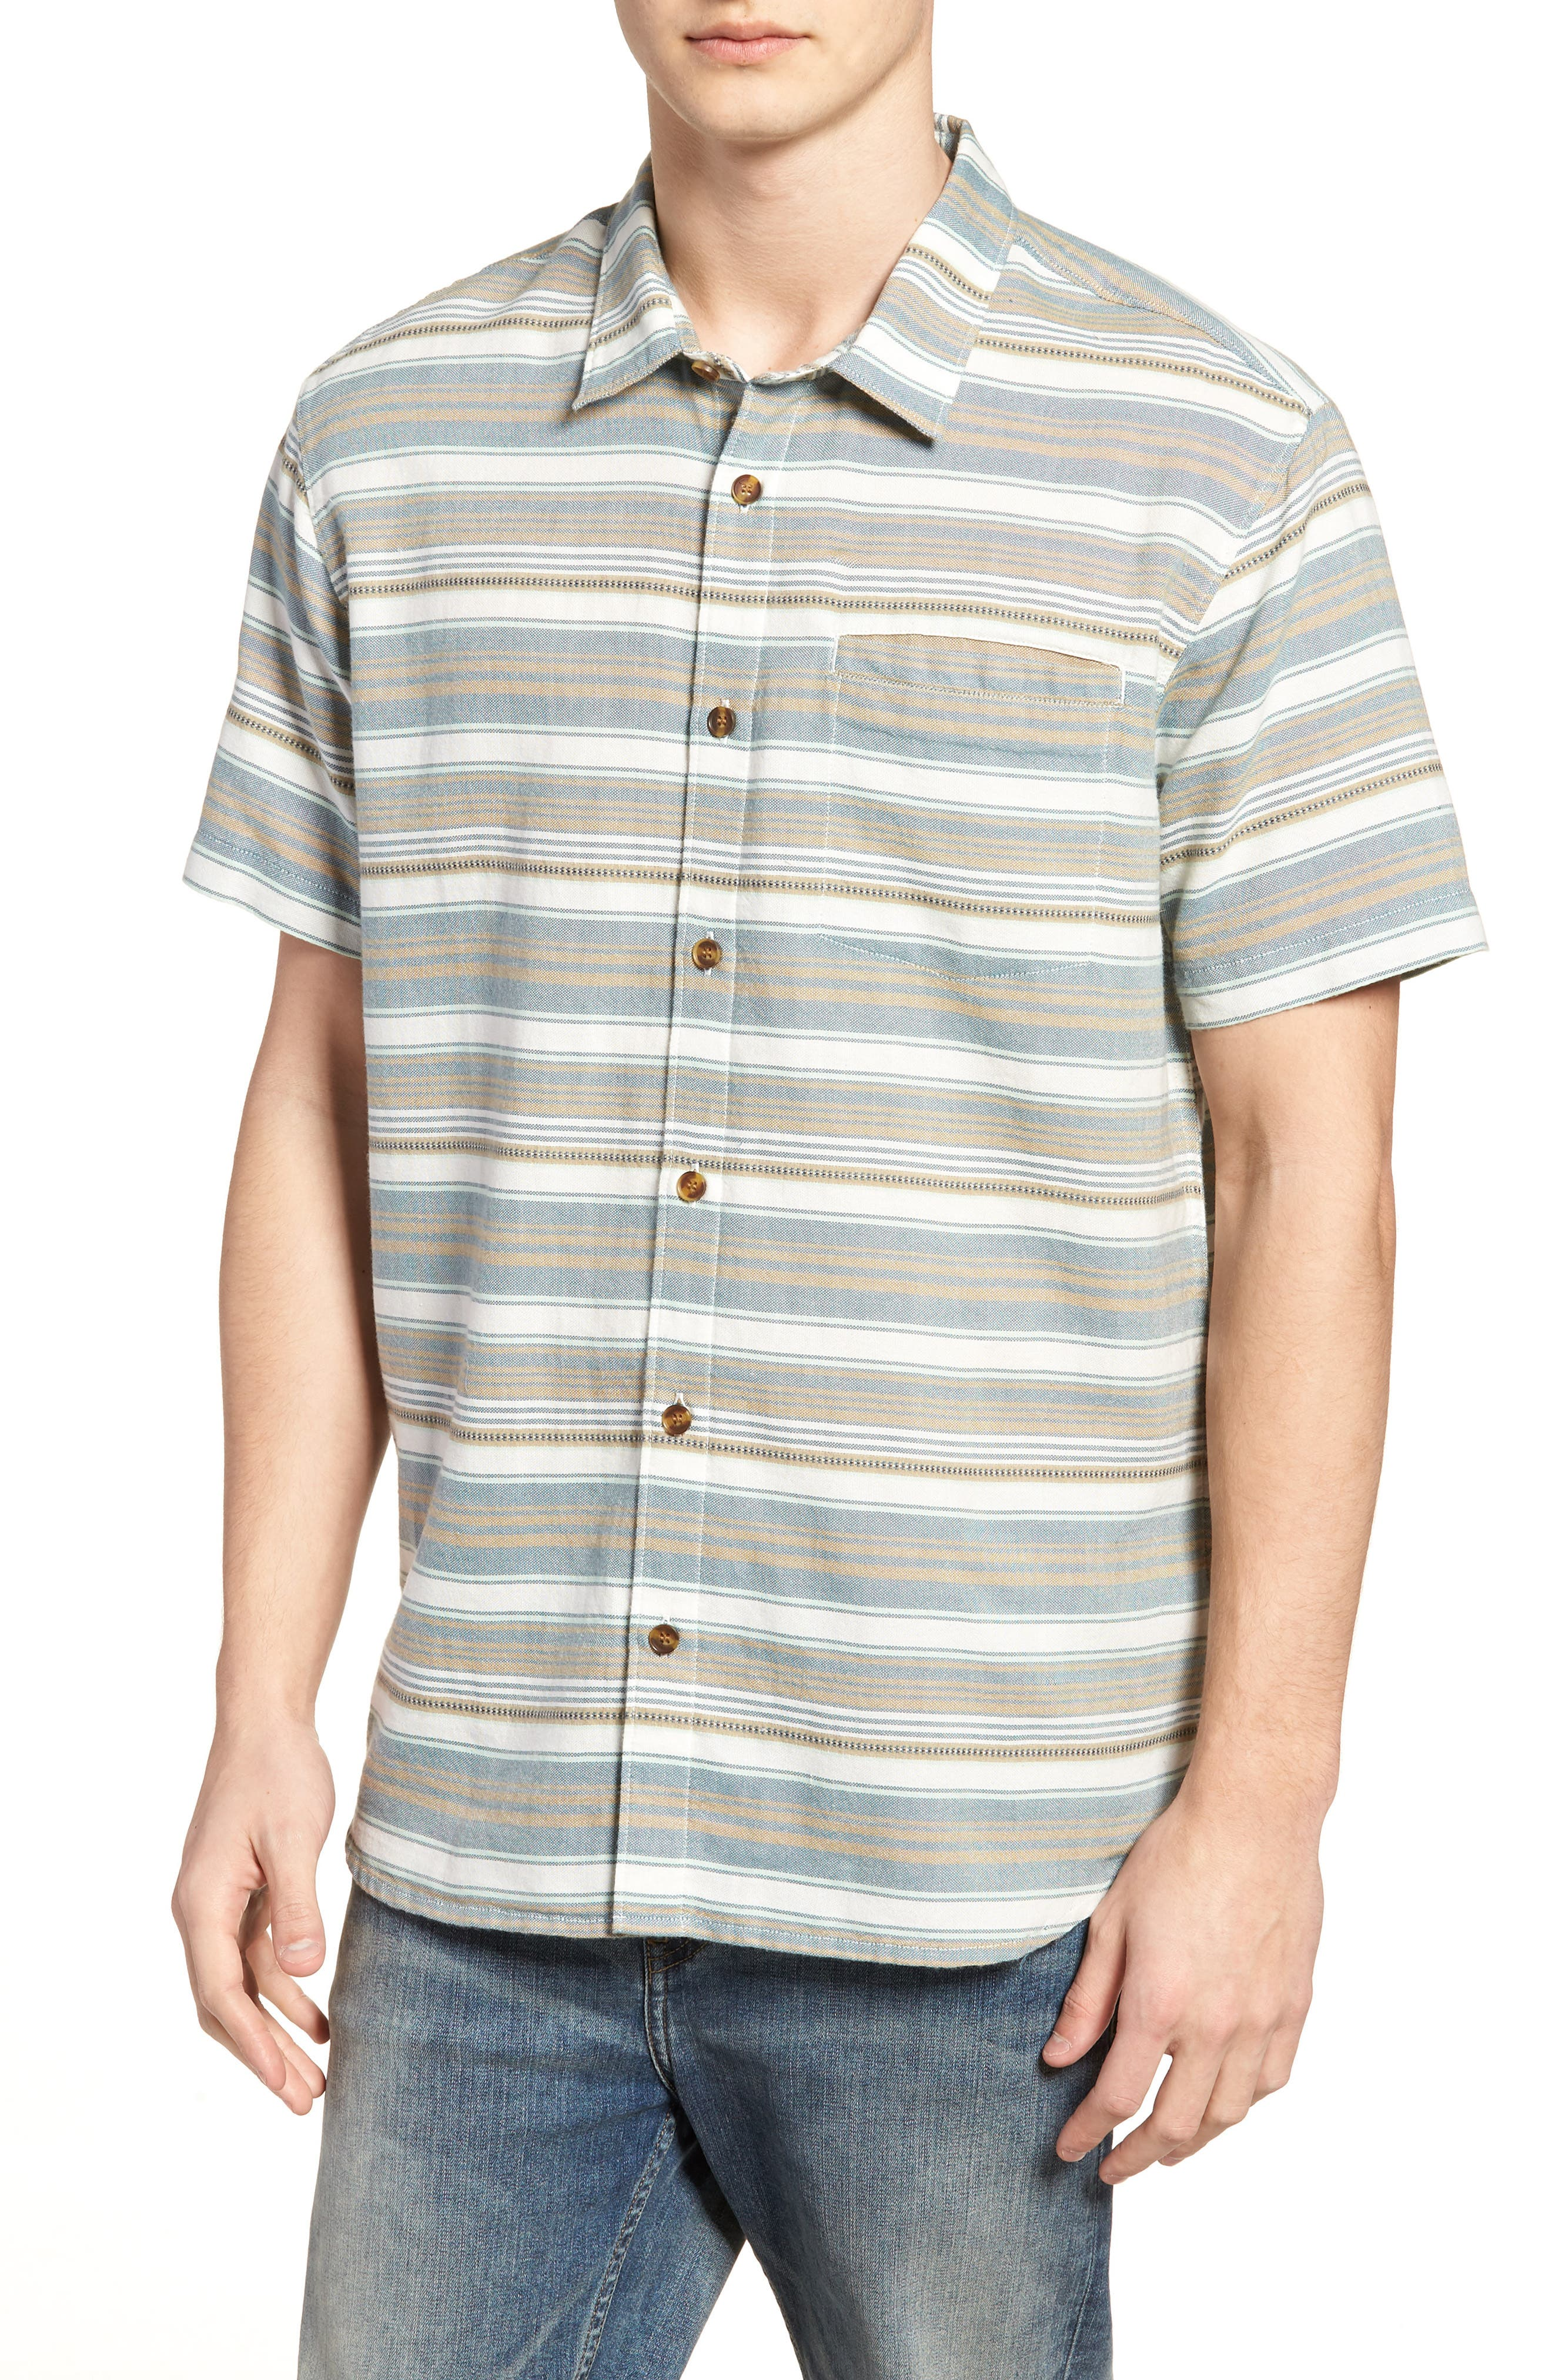 Currington Short Sleeve Shirt,                             Main thumbnail 1, color,                             Khaki